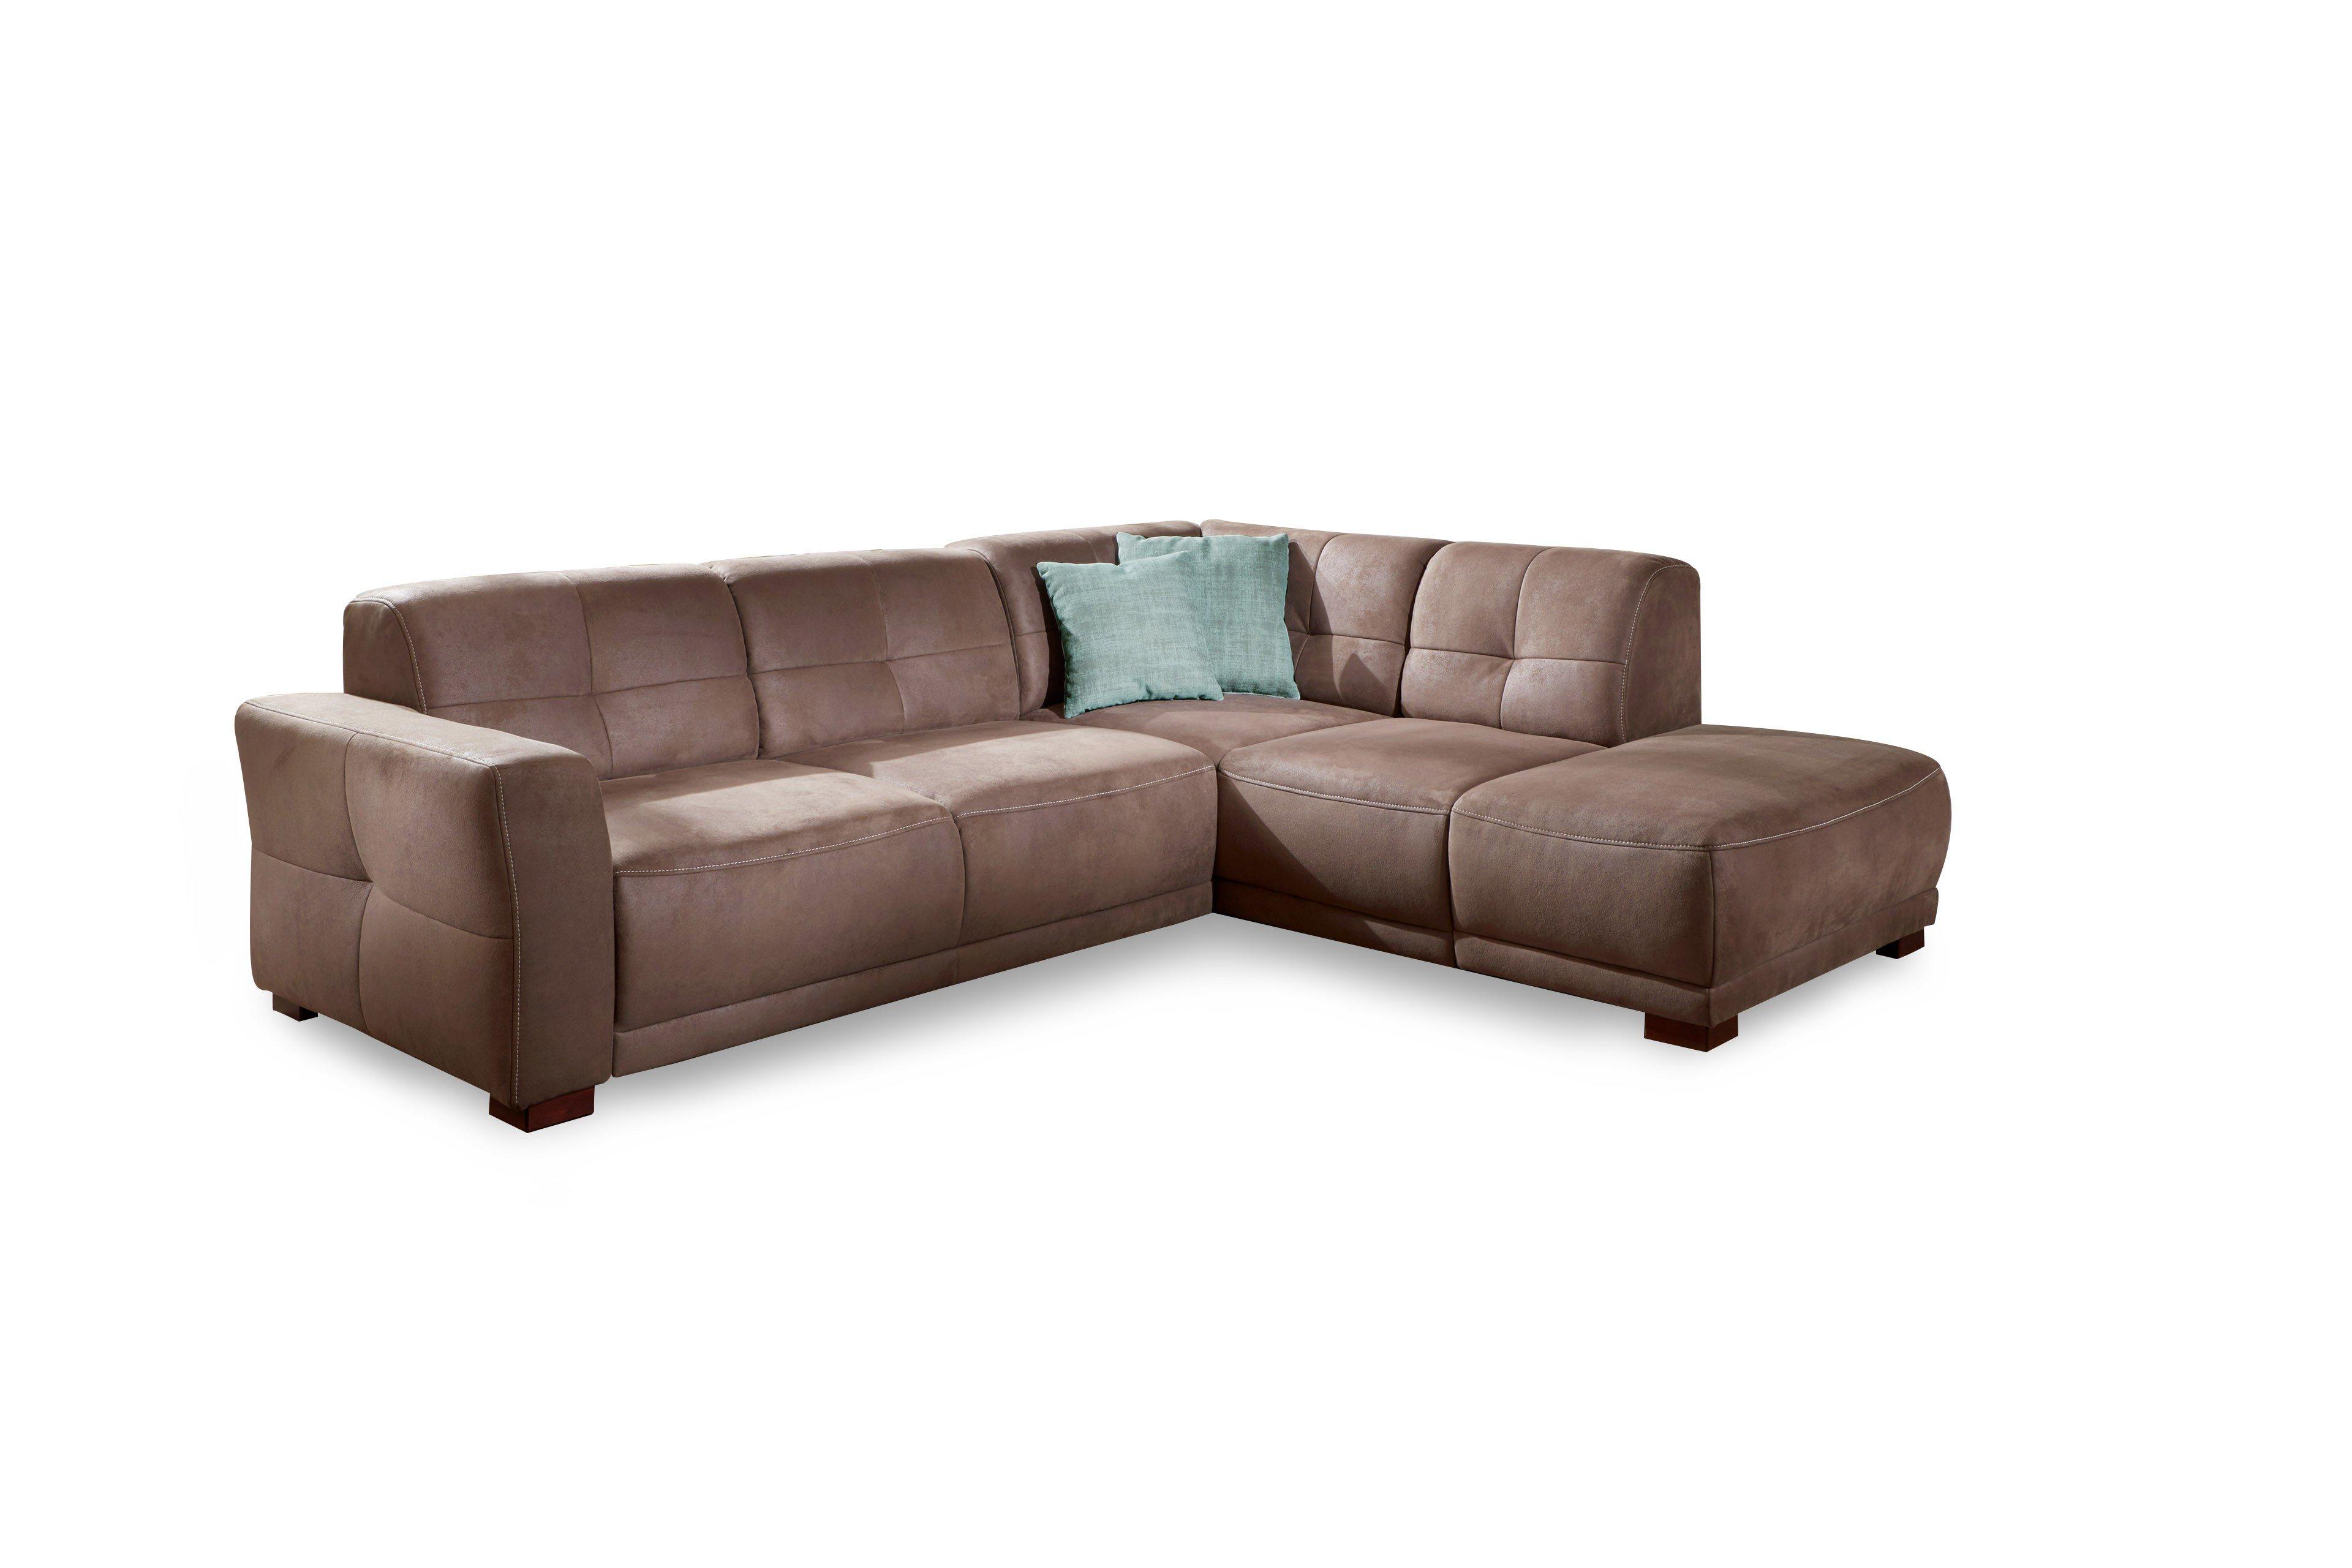 sit more home basic mondeo ecksofa in braun m bel letz ihr online shop. Black Bedroom Furniture Sets. Home Design Ideas